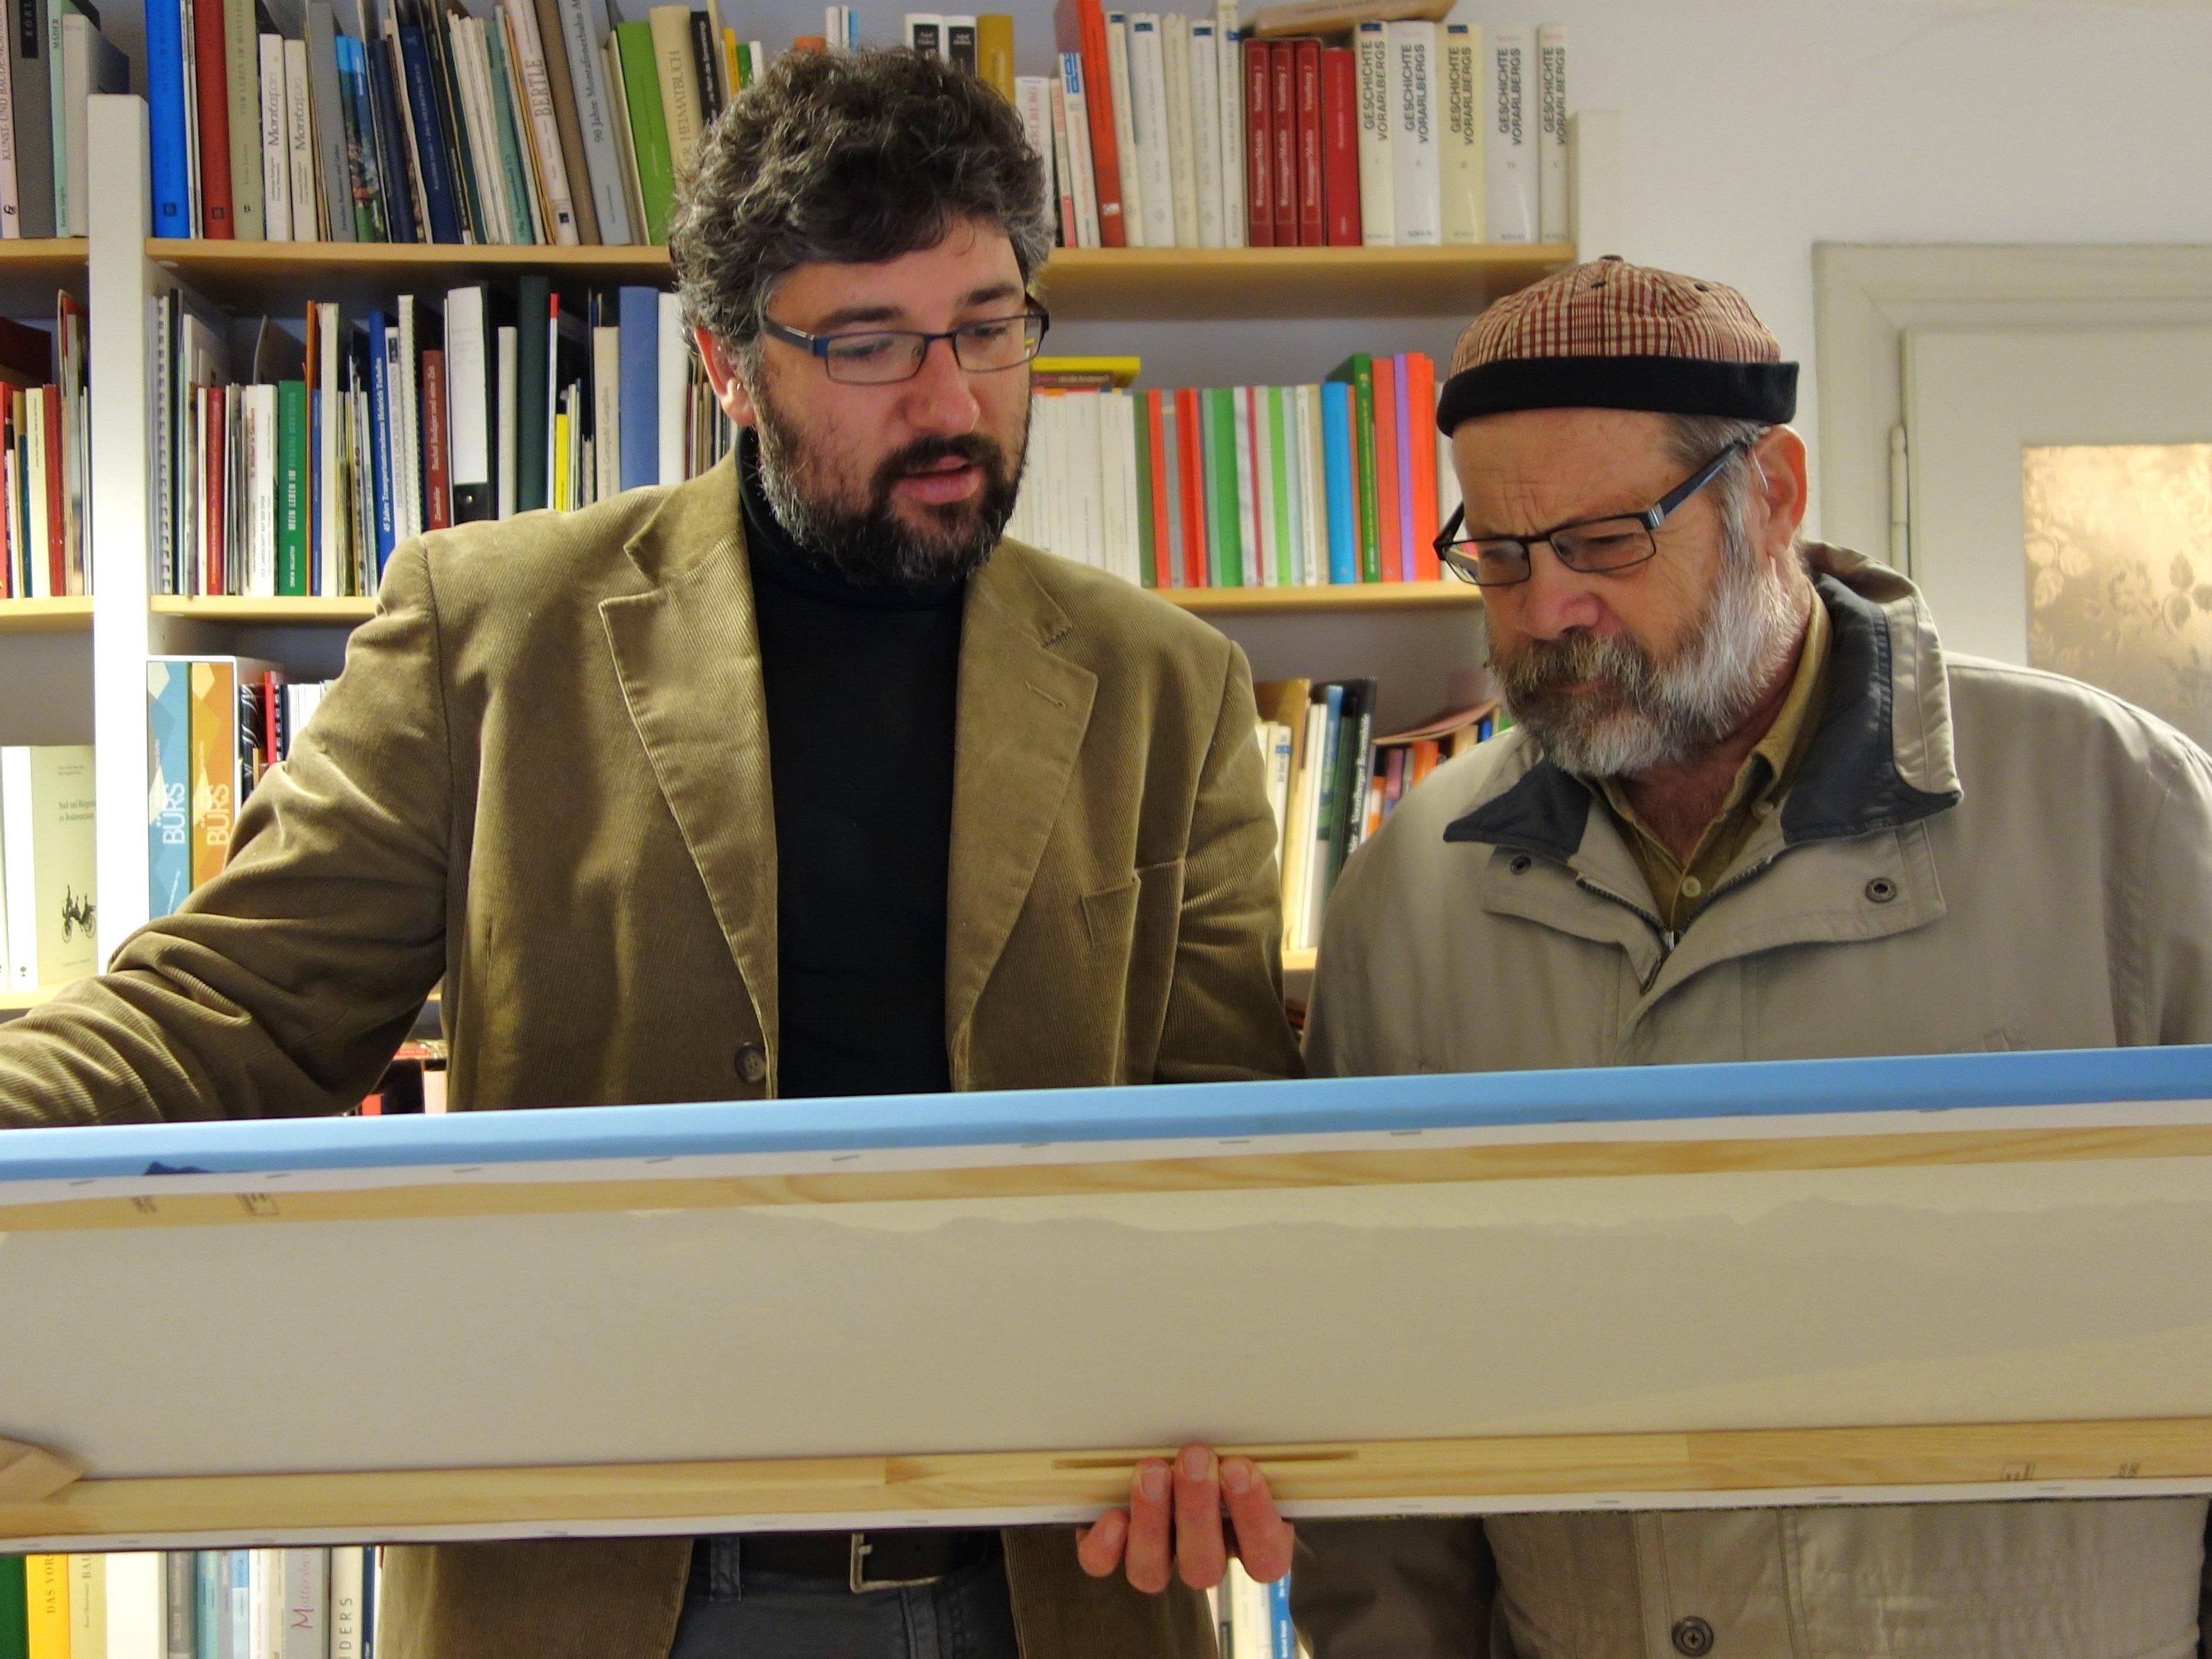 Bildübergabe an Museums-Direktor Michael Kasper durch Walter Kegele (v.l.).